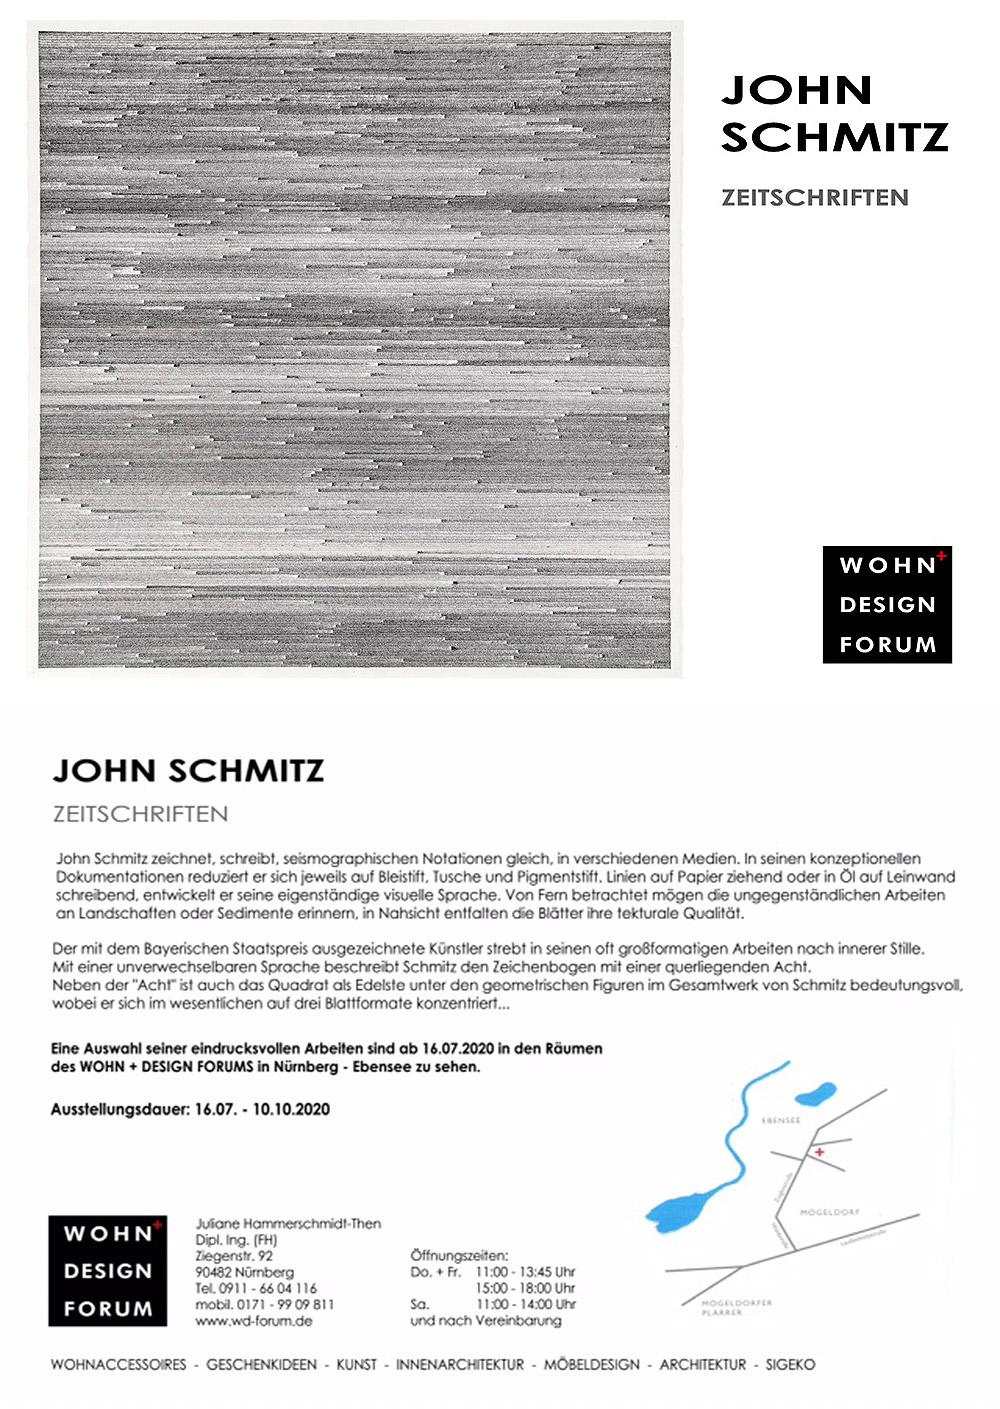 Einladung John Schmitz | Wohn Design Forum Nürnberg | 2020